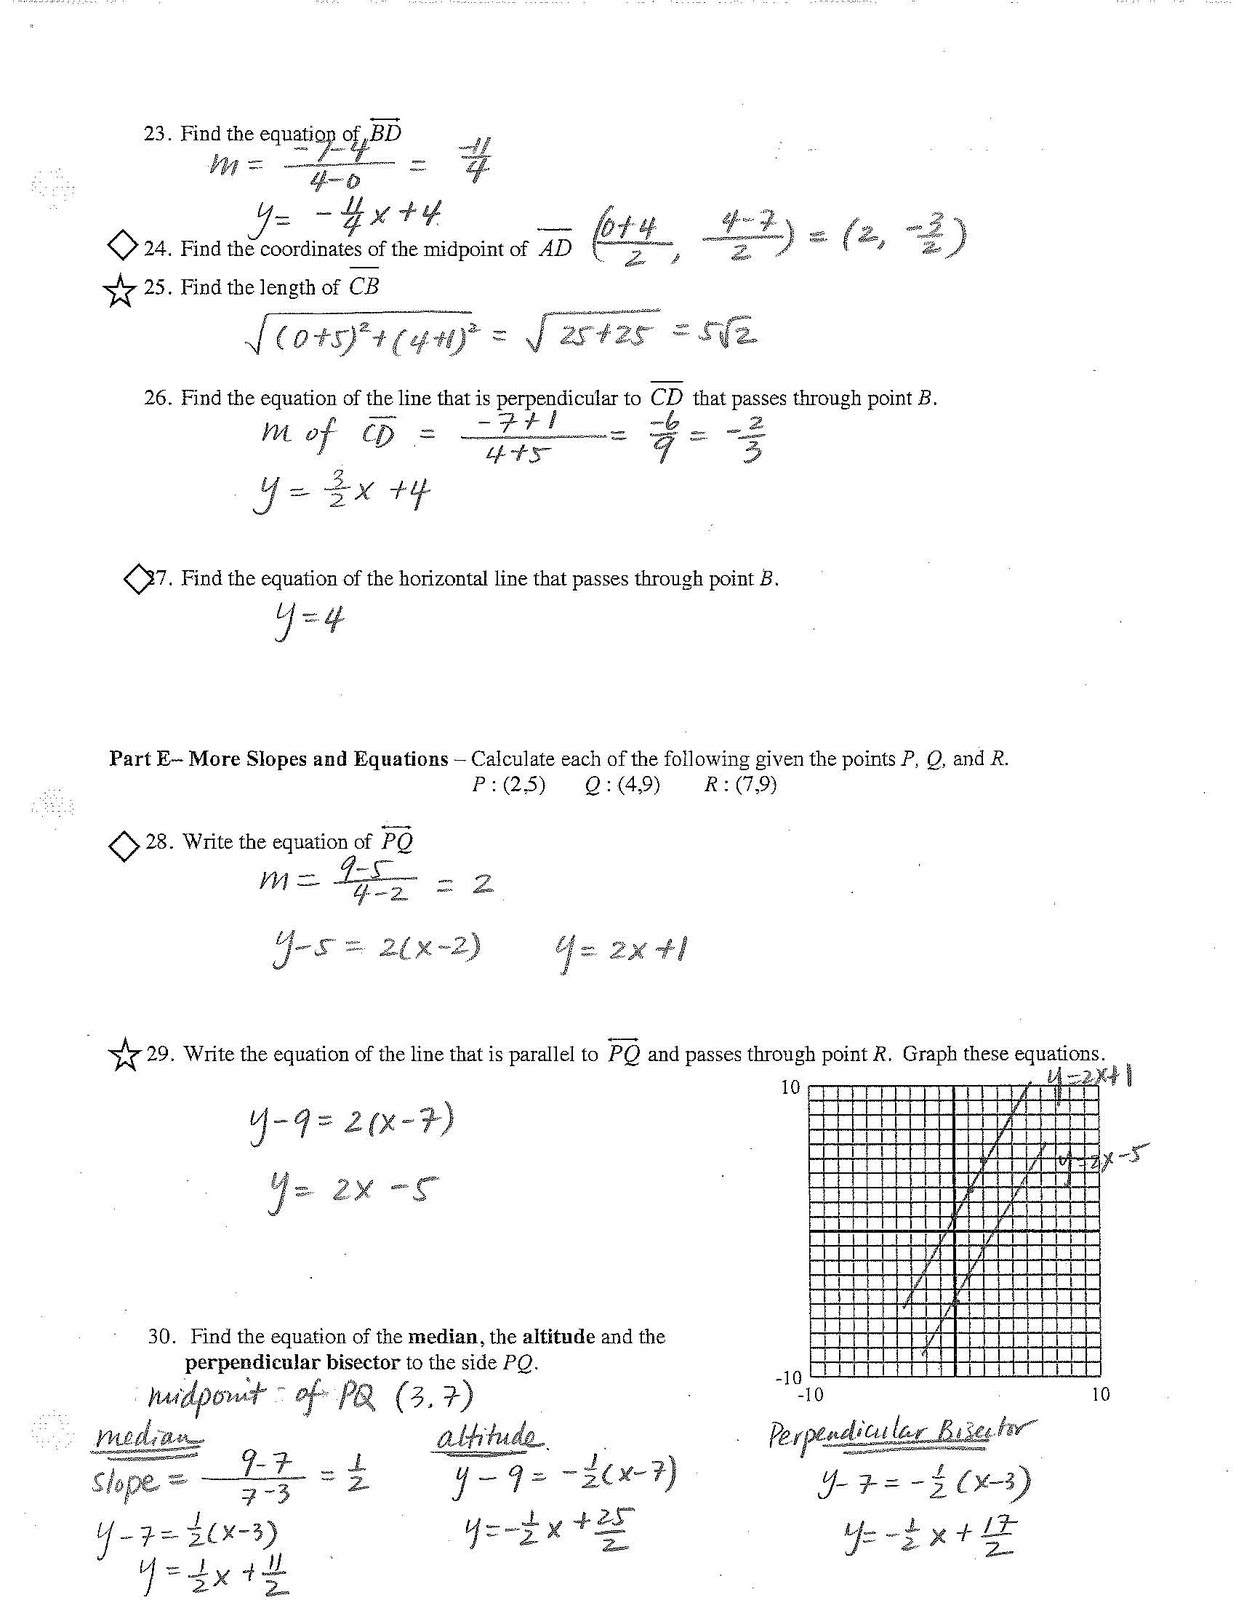 Jiazhen's Geometry: Final Review Sheet Answers are here!